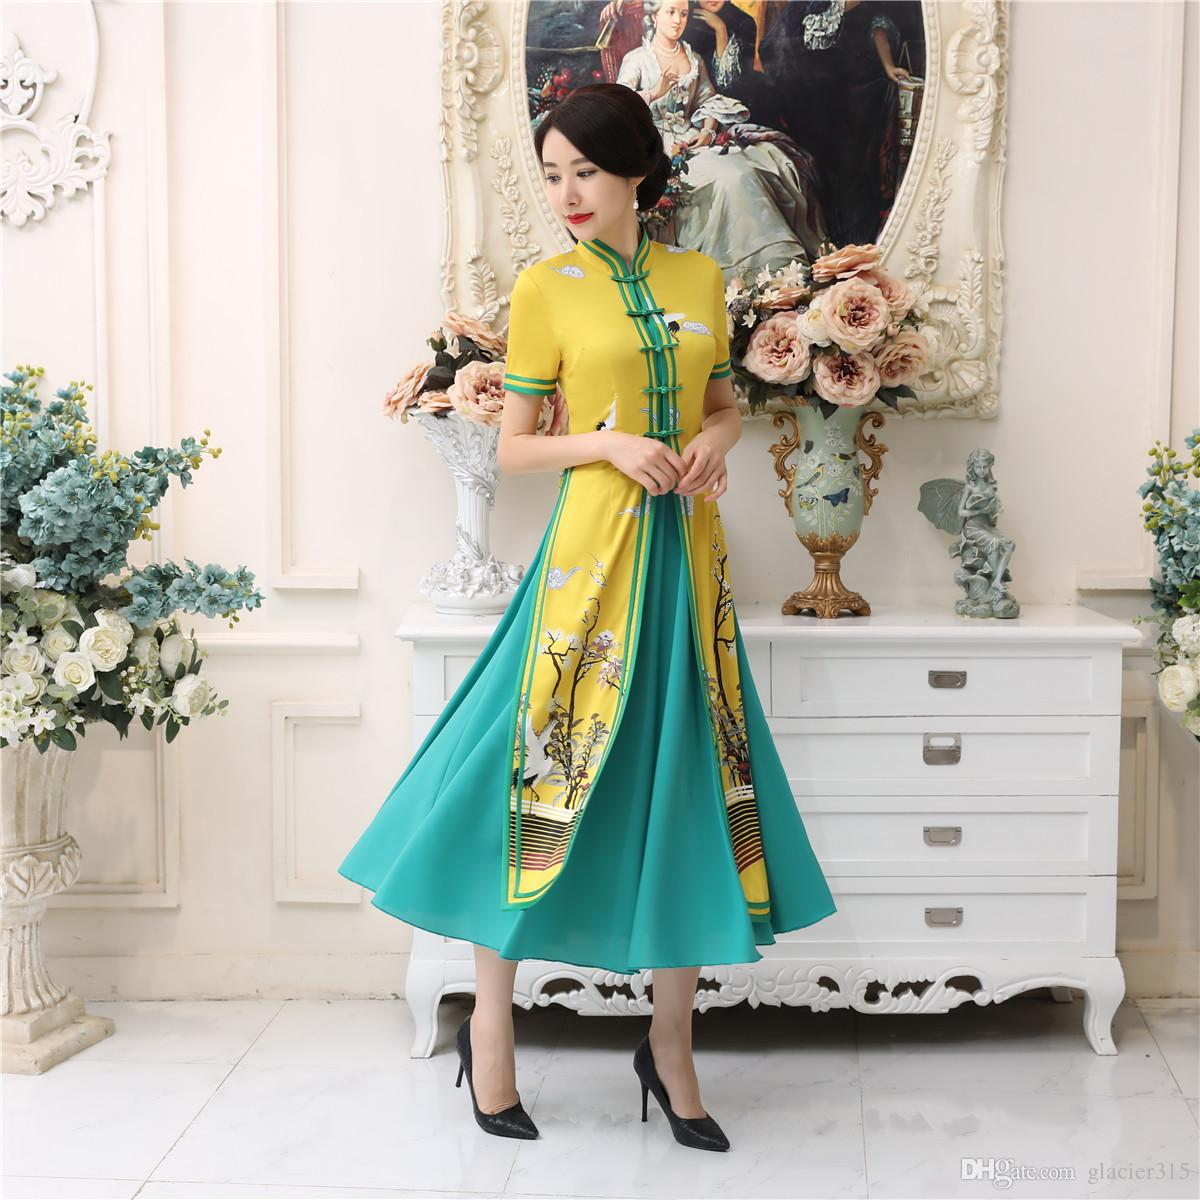 d938a642a6 Shanghai Story Vietnam Dress Chinese Traditional Clothing For Women Qipao  Long Chinese Oriental Dress Modern Cheongsam Ao Dai Dress Aodai Dress Ao  Dai Dress ...